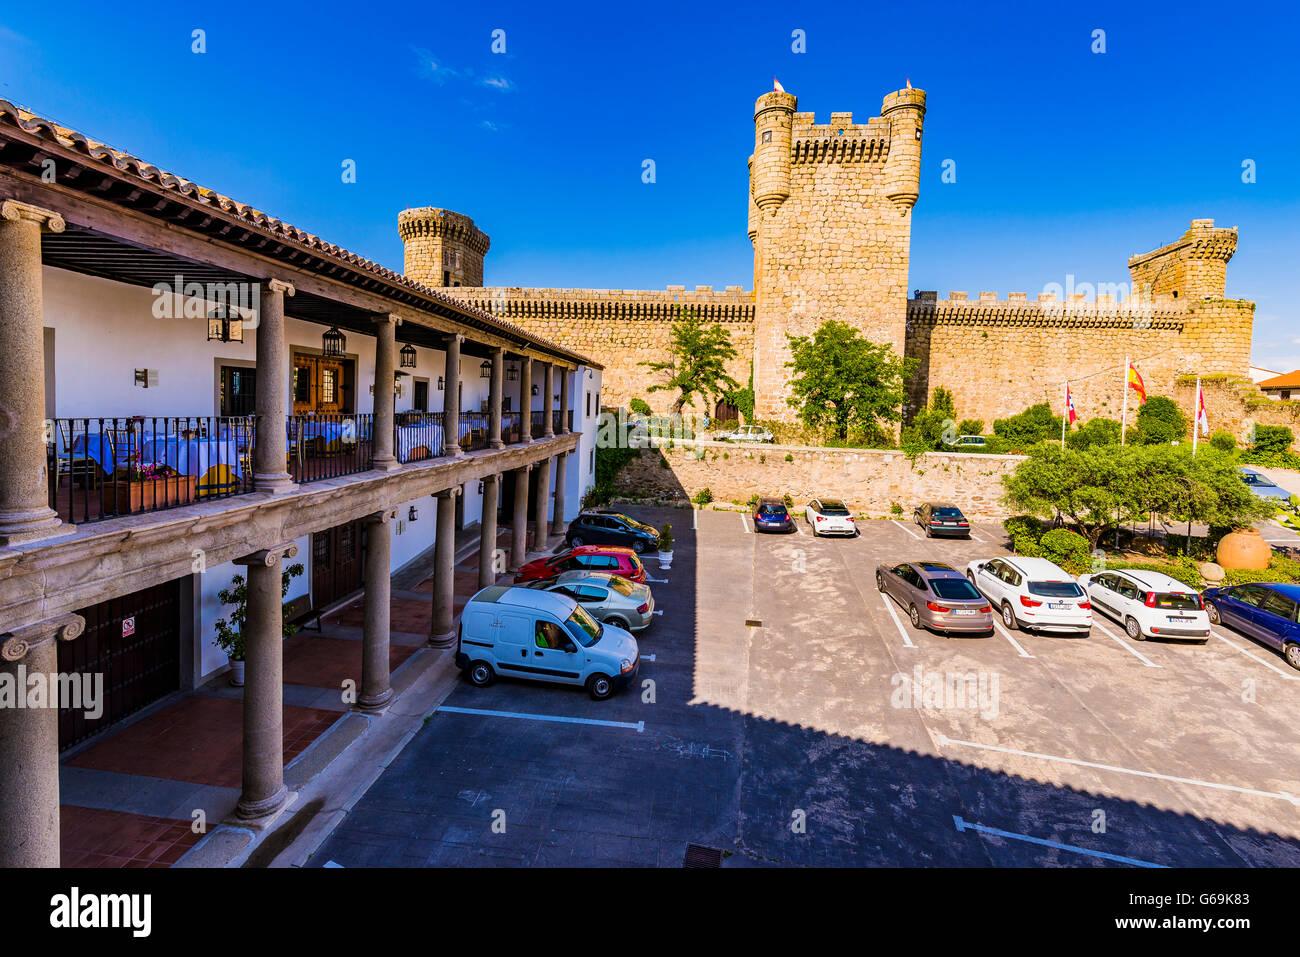 Parador Nacional de Turismo and Castle of Oropesa, Toledo, Castile-La Mancha, Spain, Europe - Stock Image